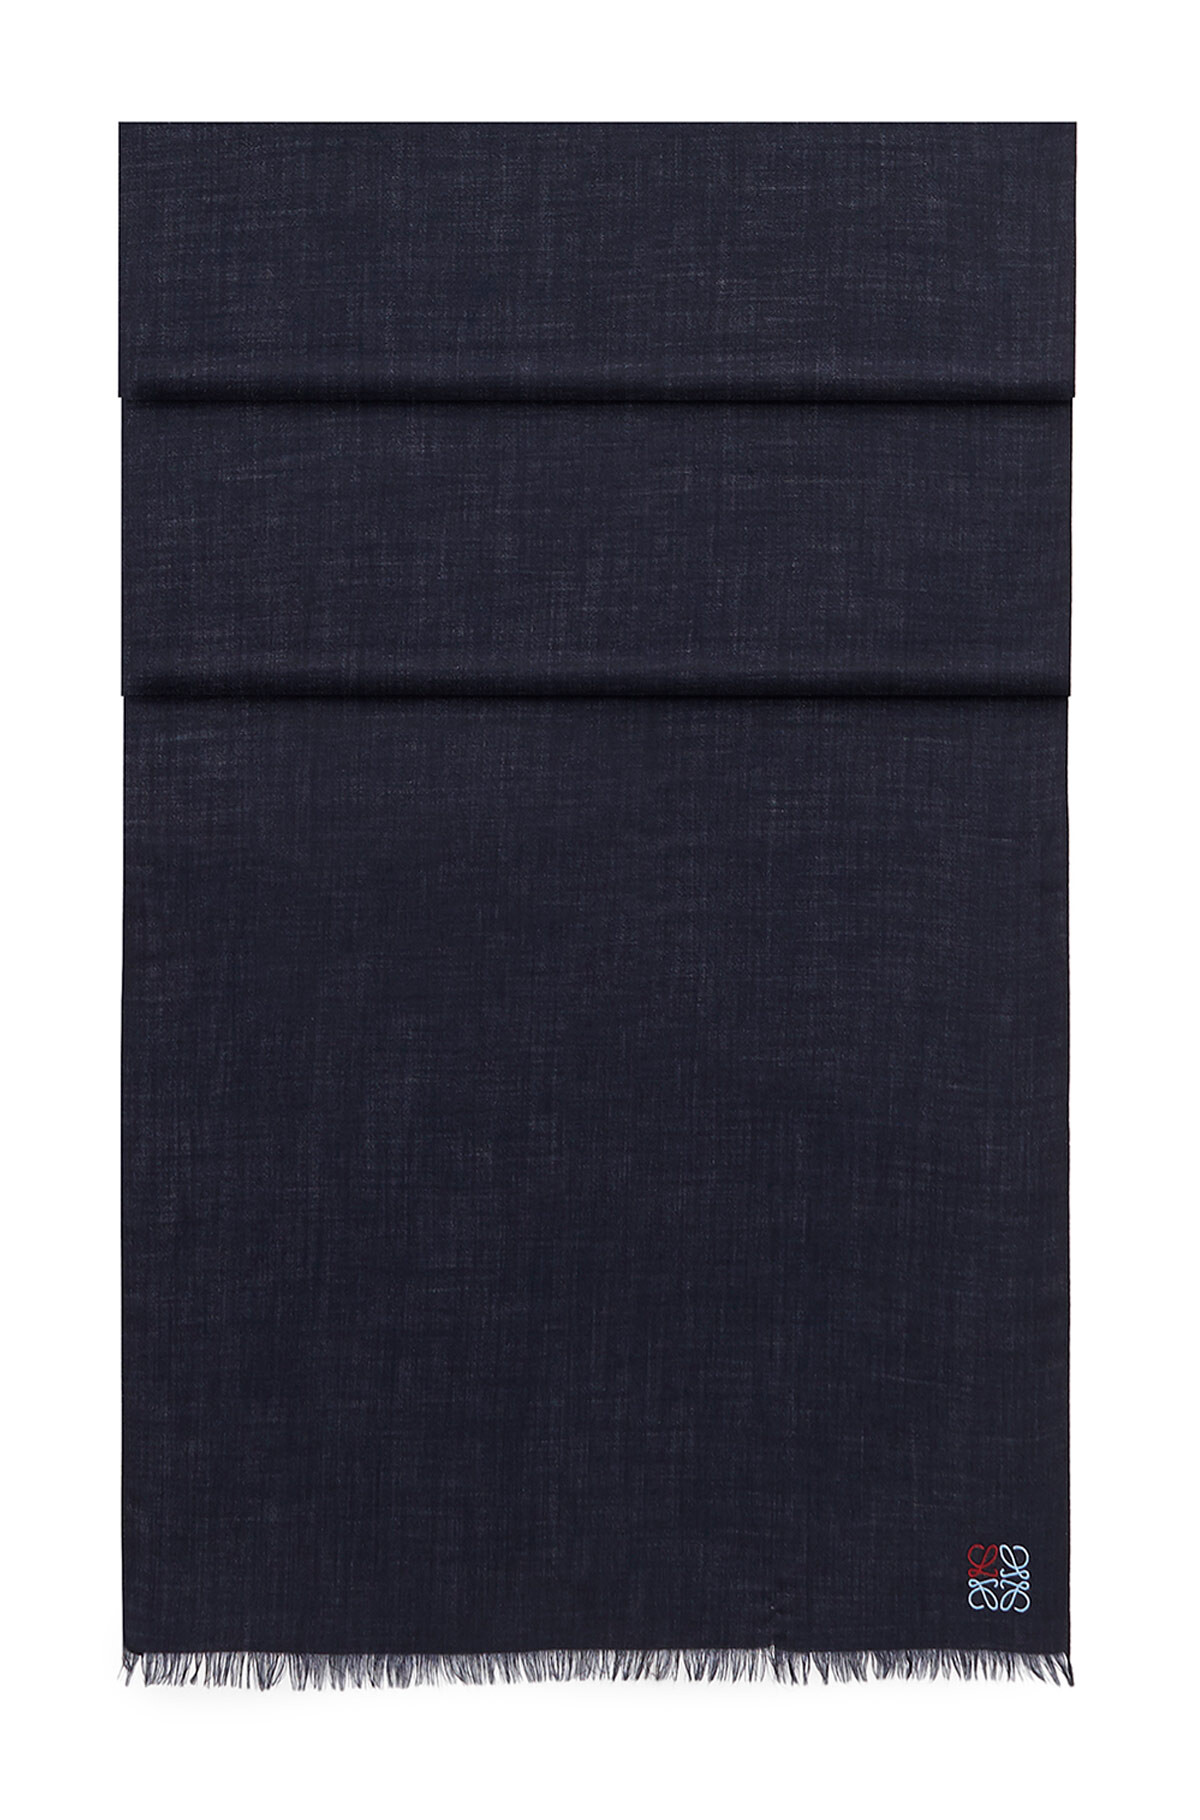 LOEWE 70X200 Anagram Scarf Navy Blue front